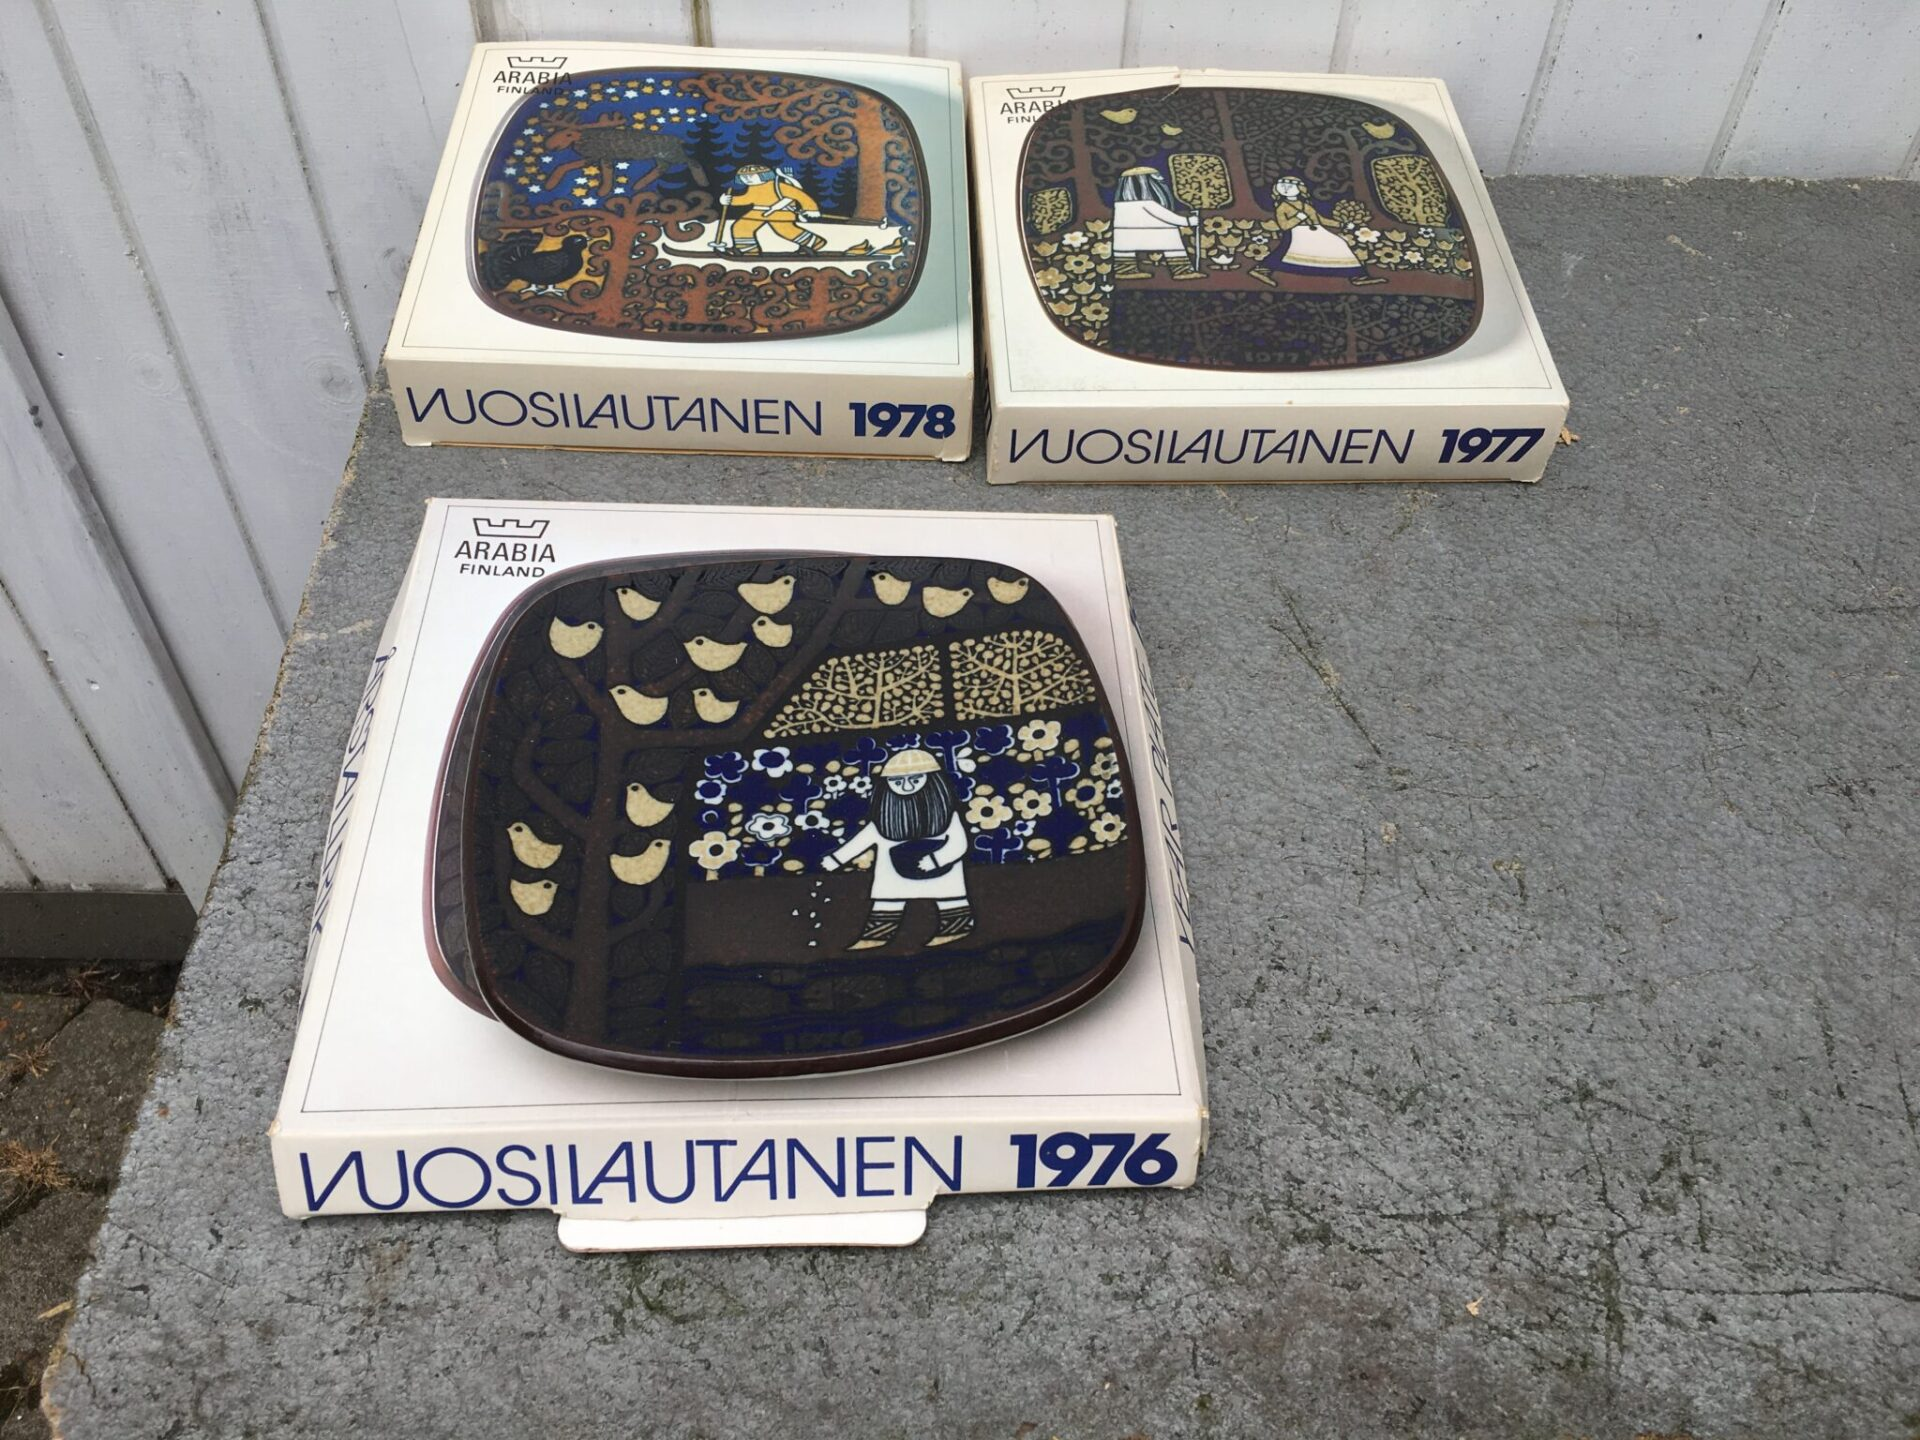 Arabia, Finland, årstallekner pr. stk 100 kr. (1976 er solgt)